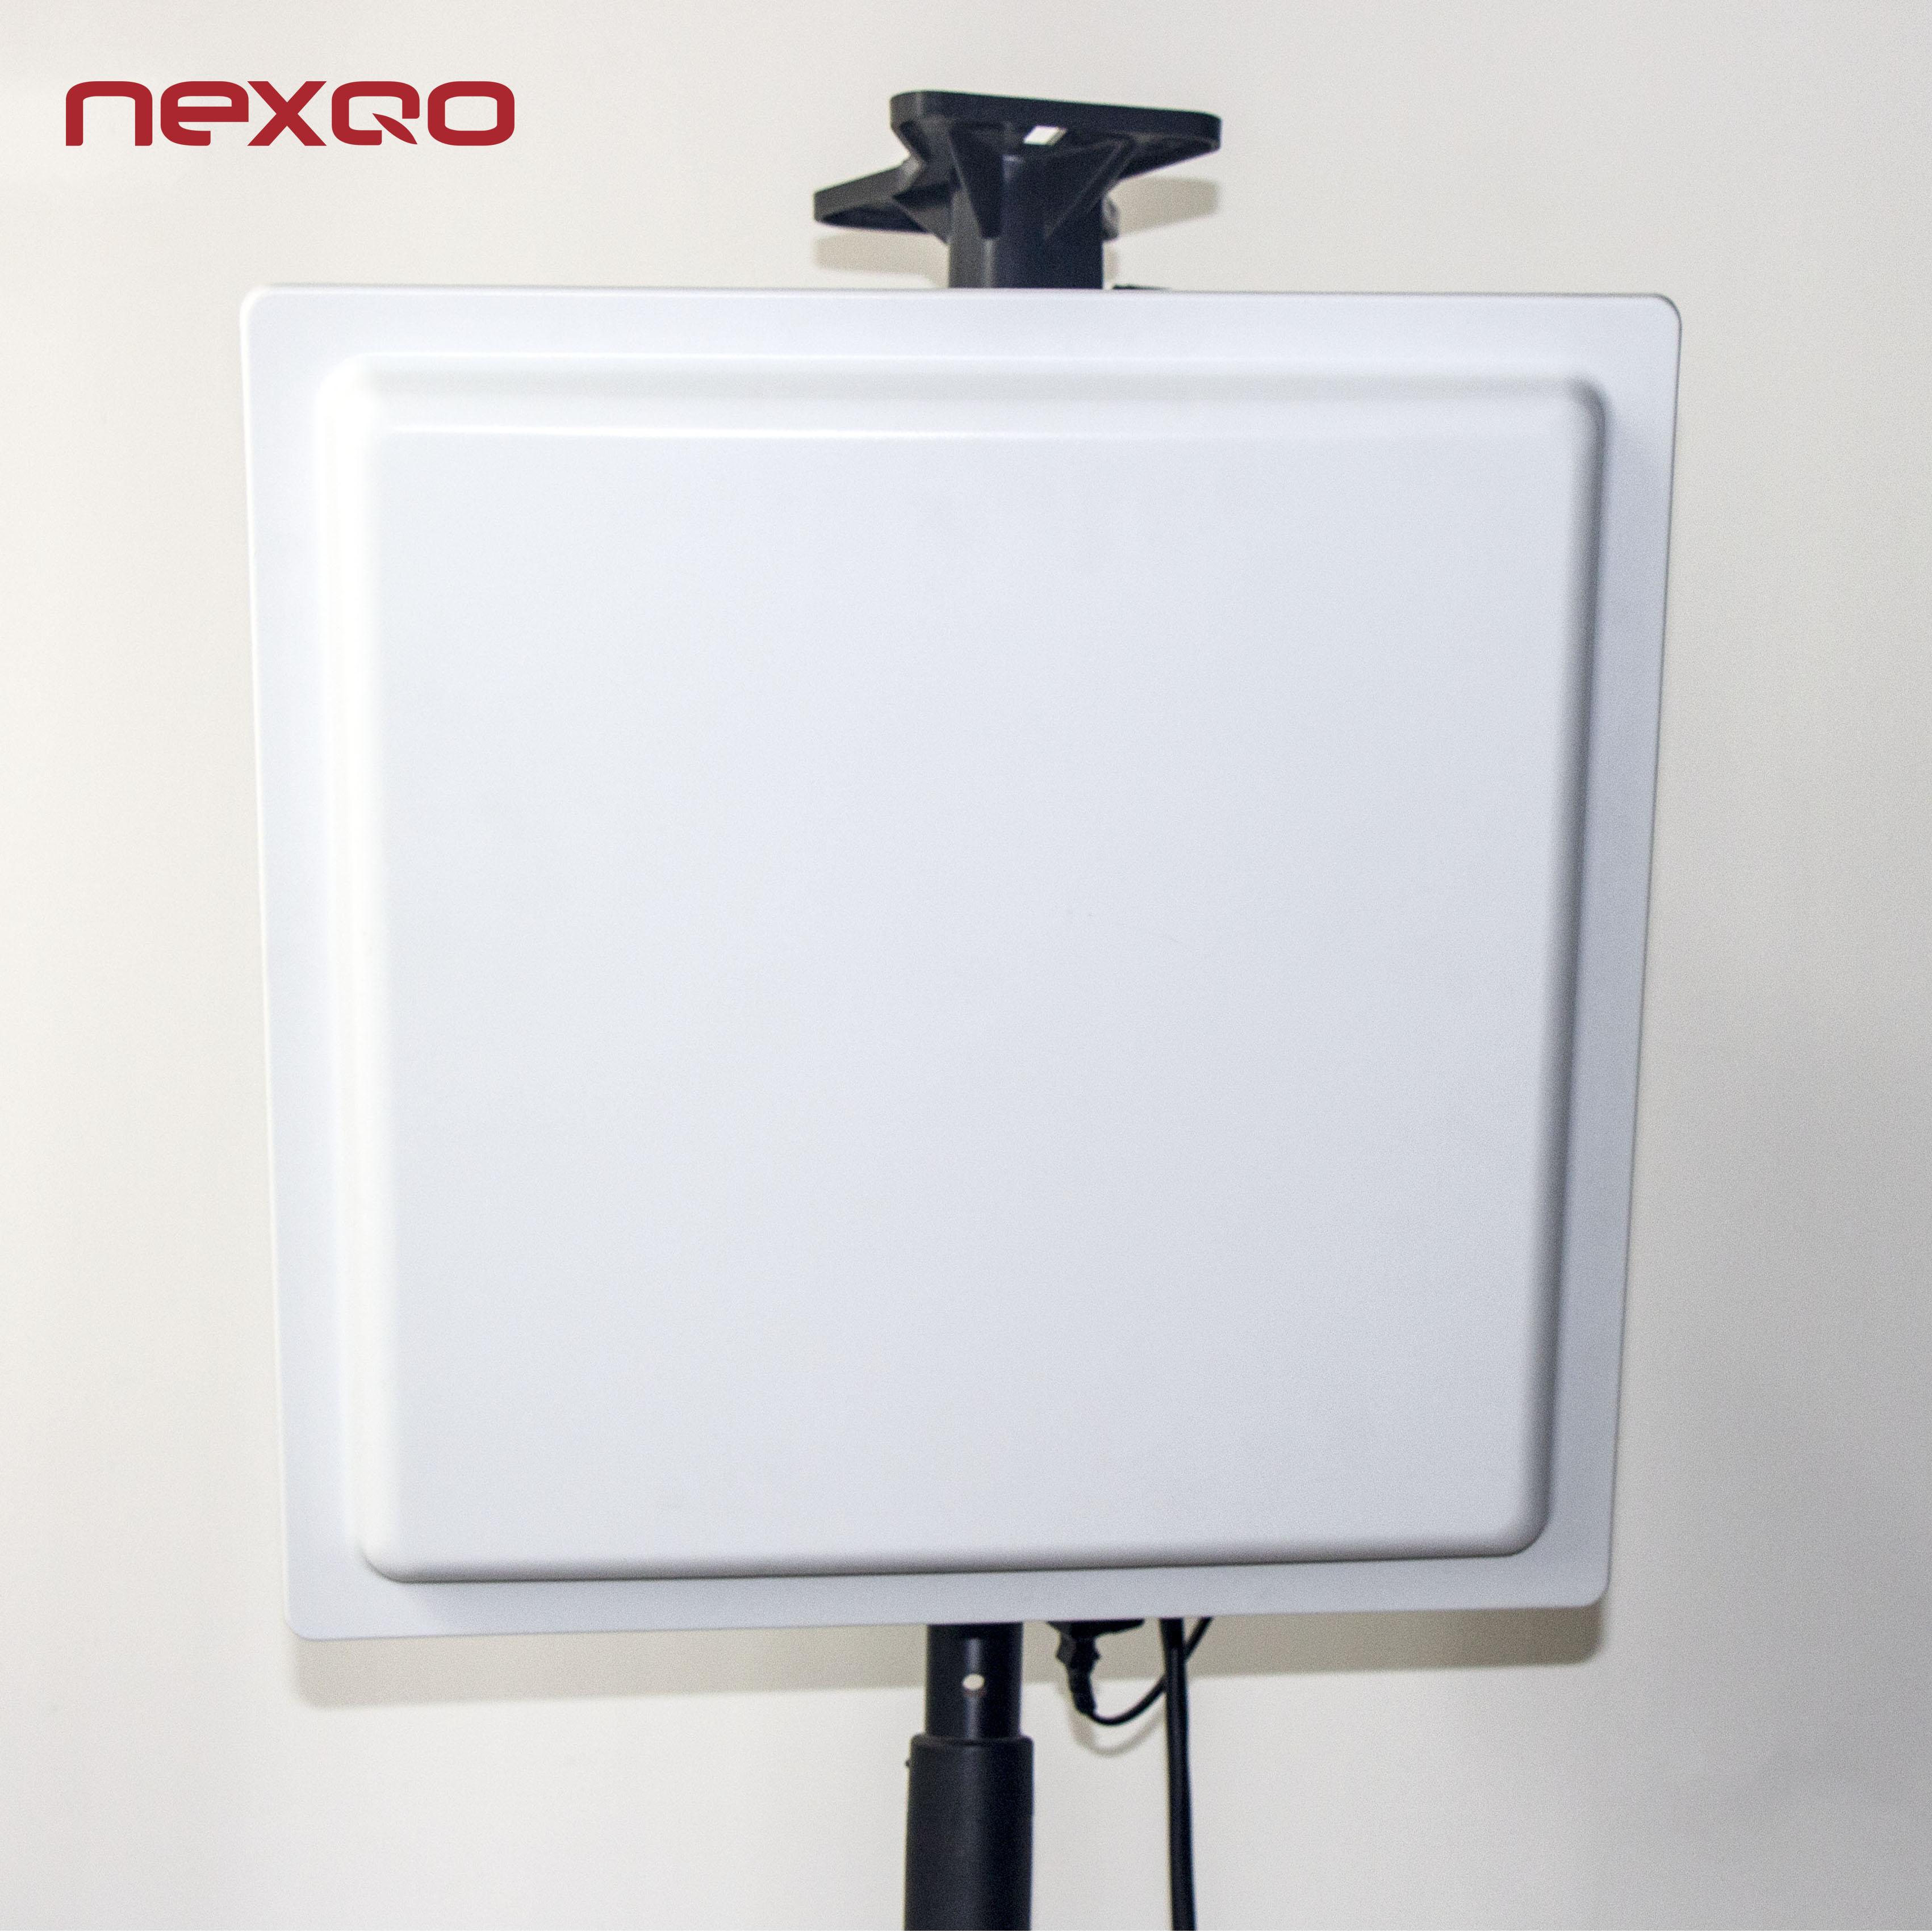 Inteligente rfid uhf antena 865-868 MHz/902-928 MHz antena para controle de acesso porta rfid